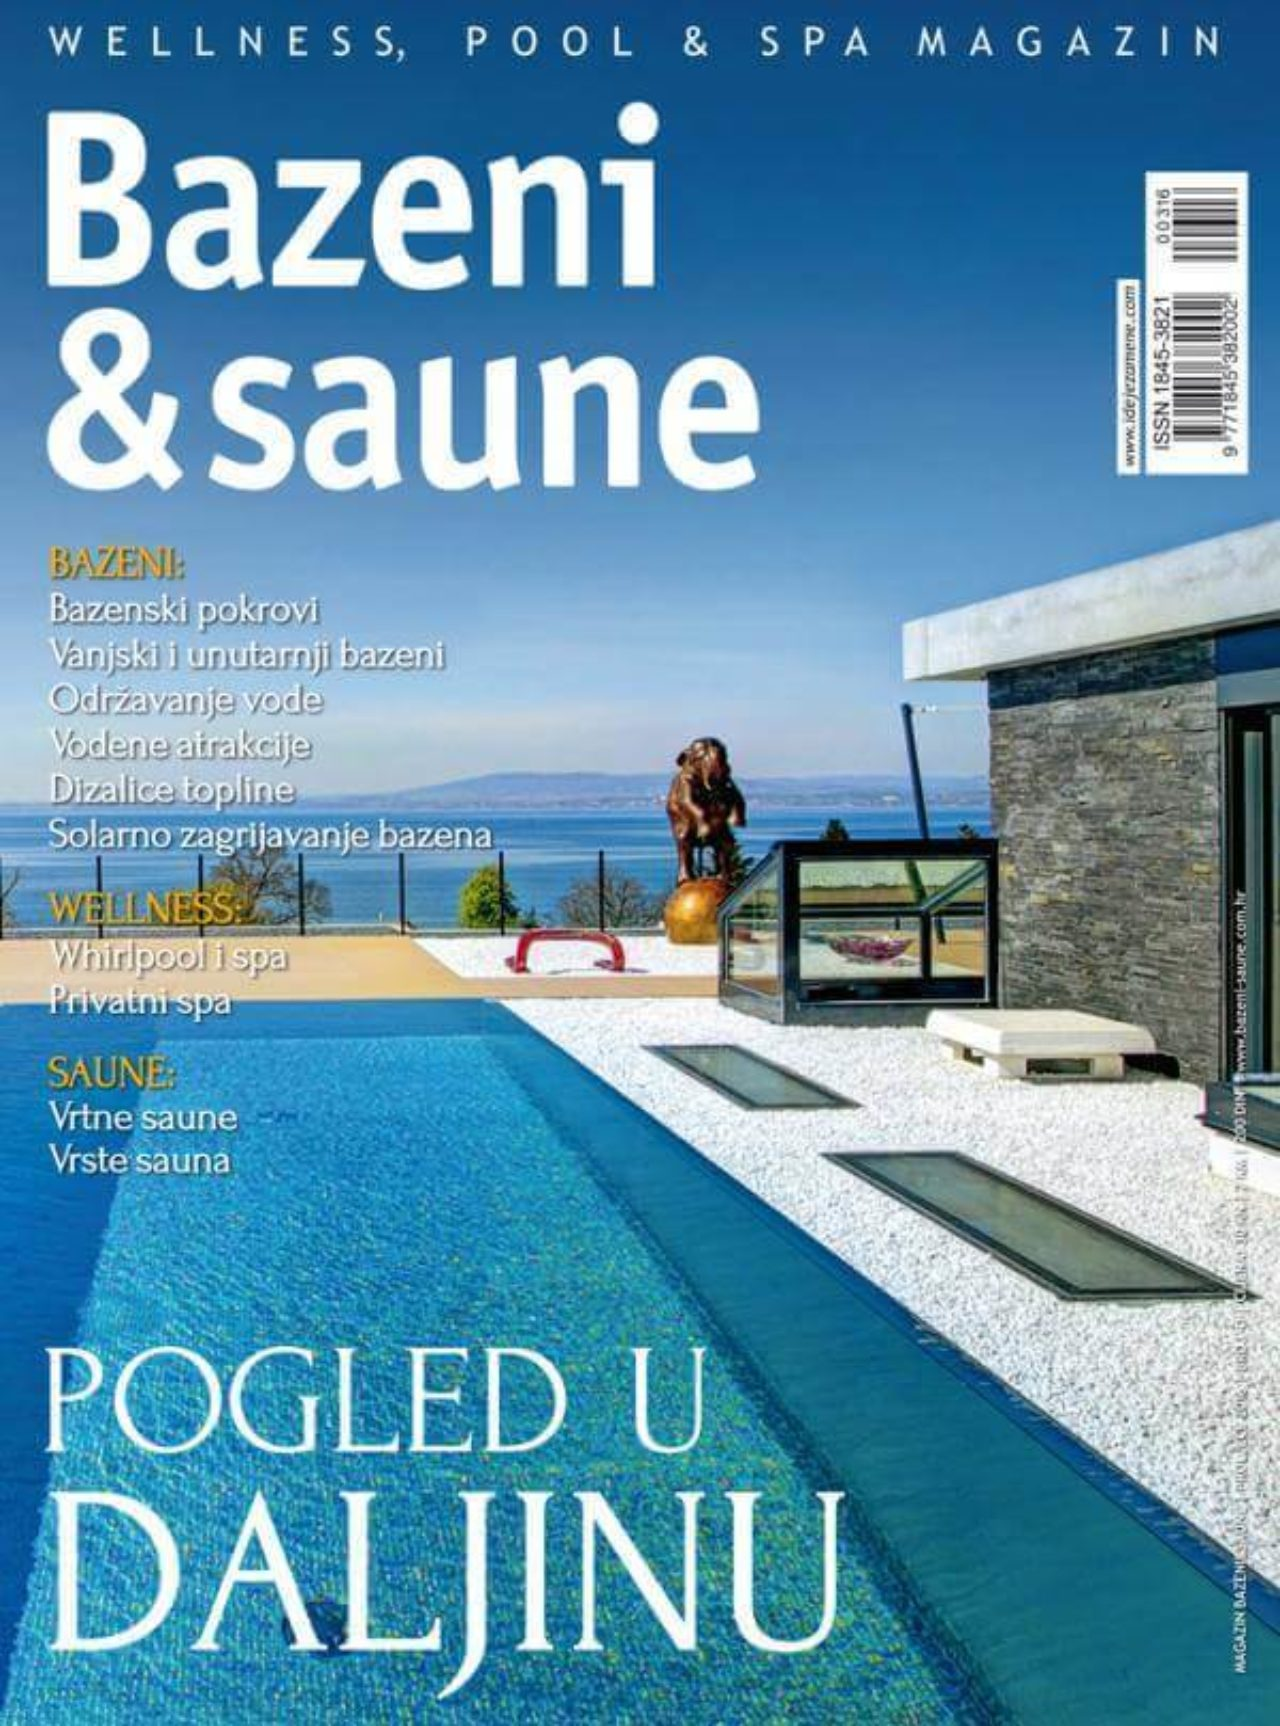 Bazeni&saune Spring/2016 | Blog - Microwell